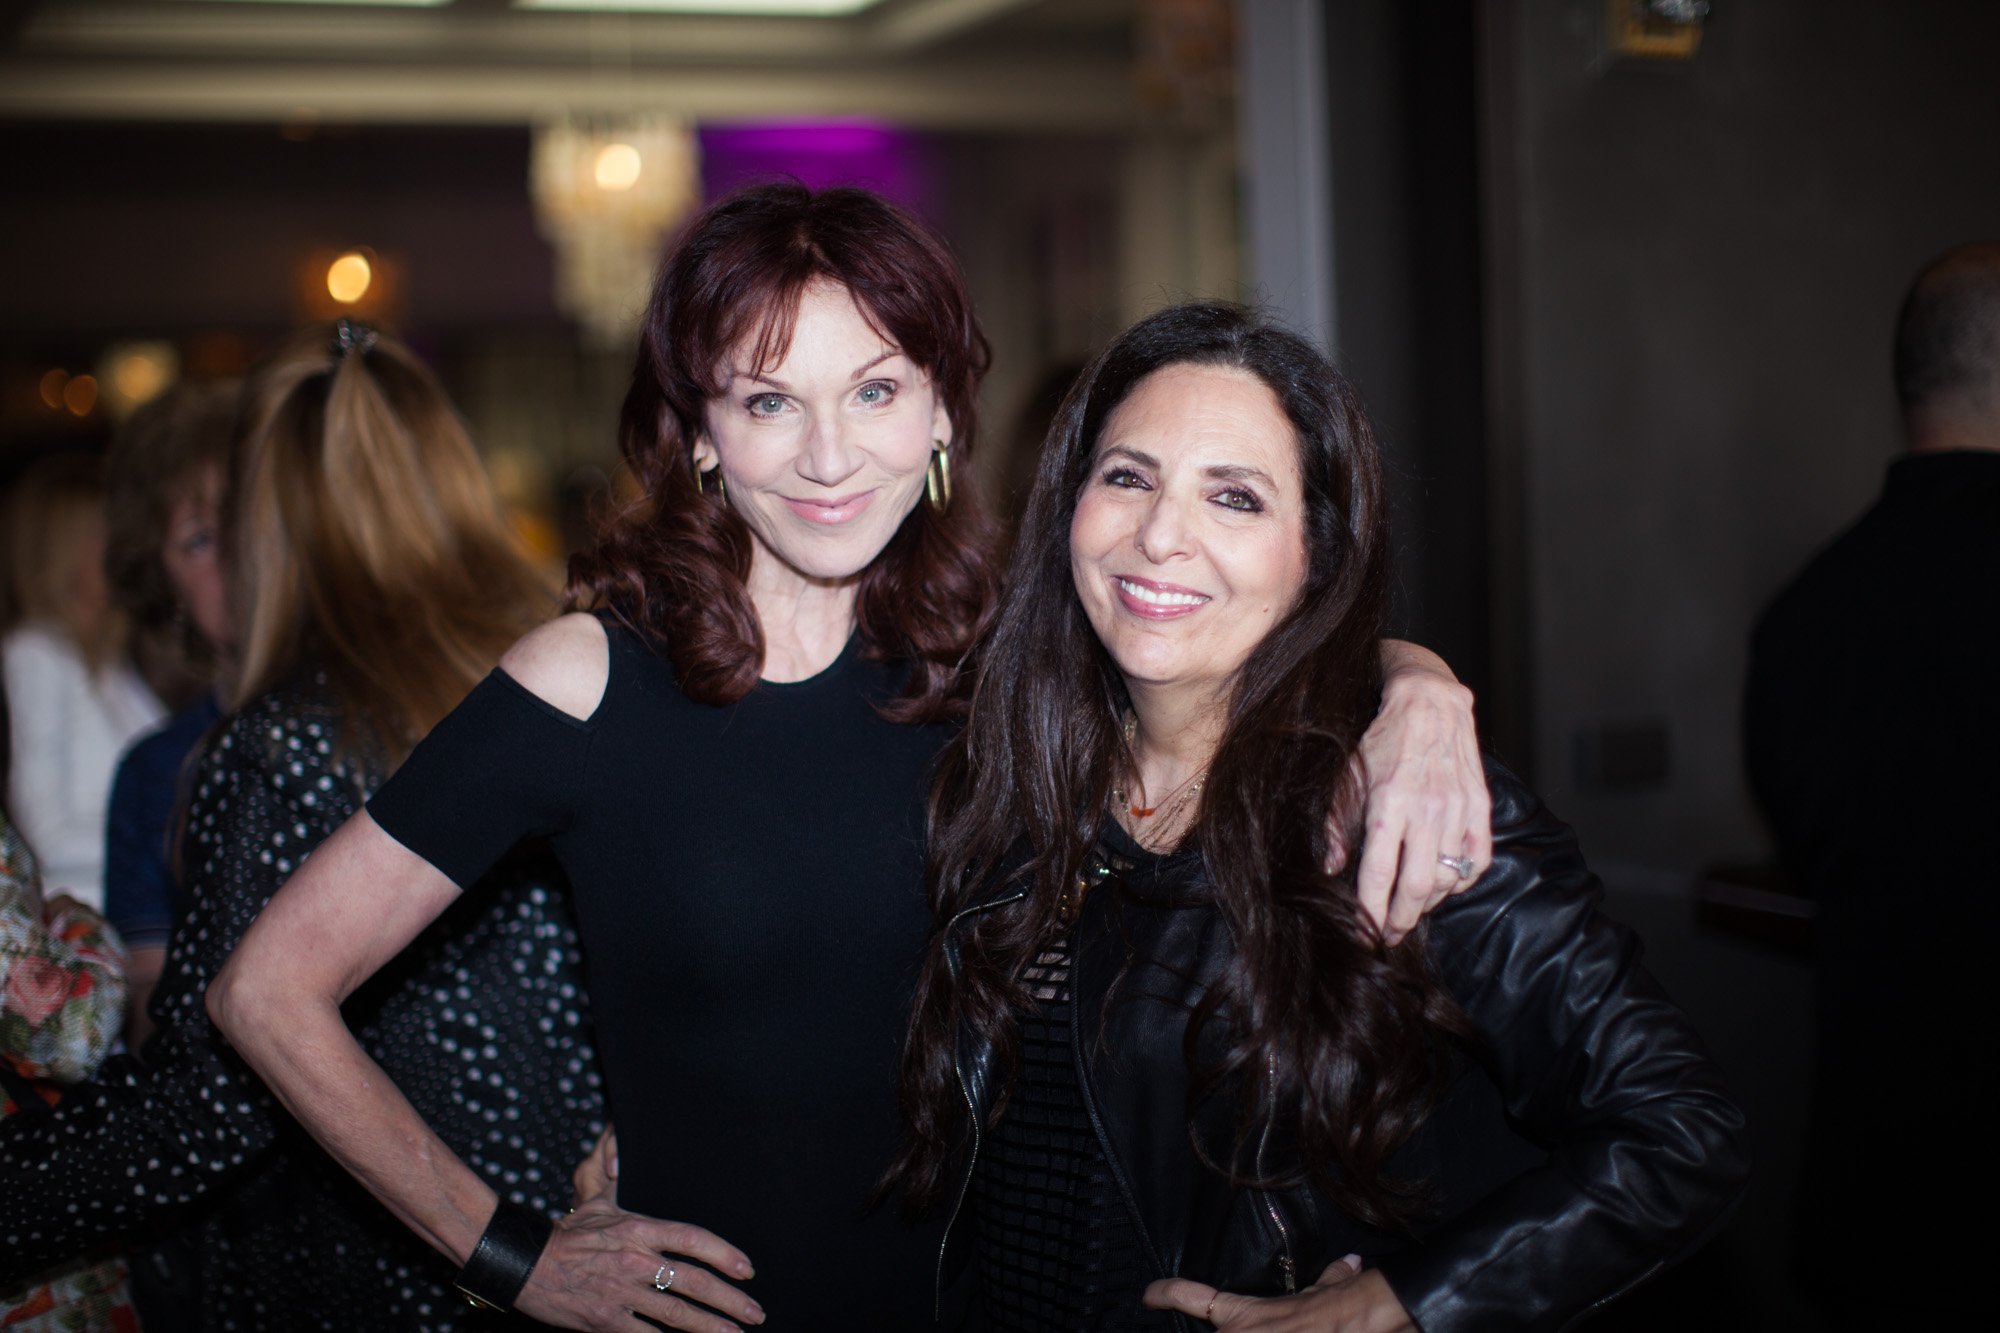 Cofounder Sharon Feldstein with Marilu Henner